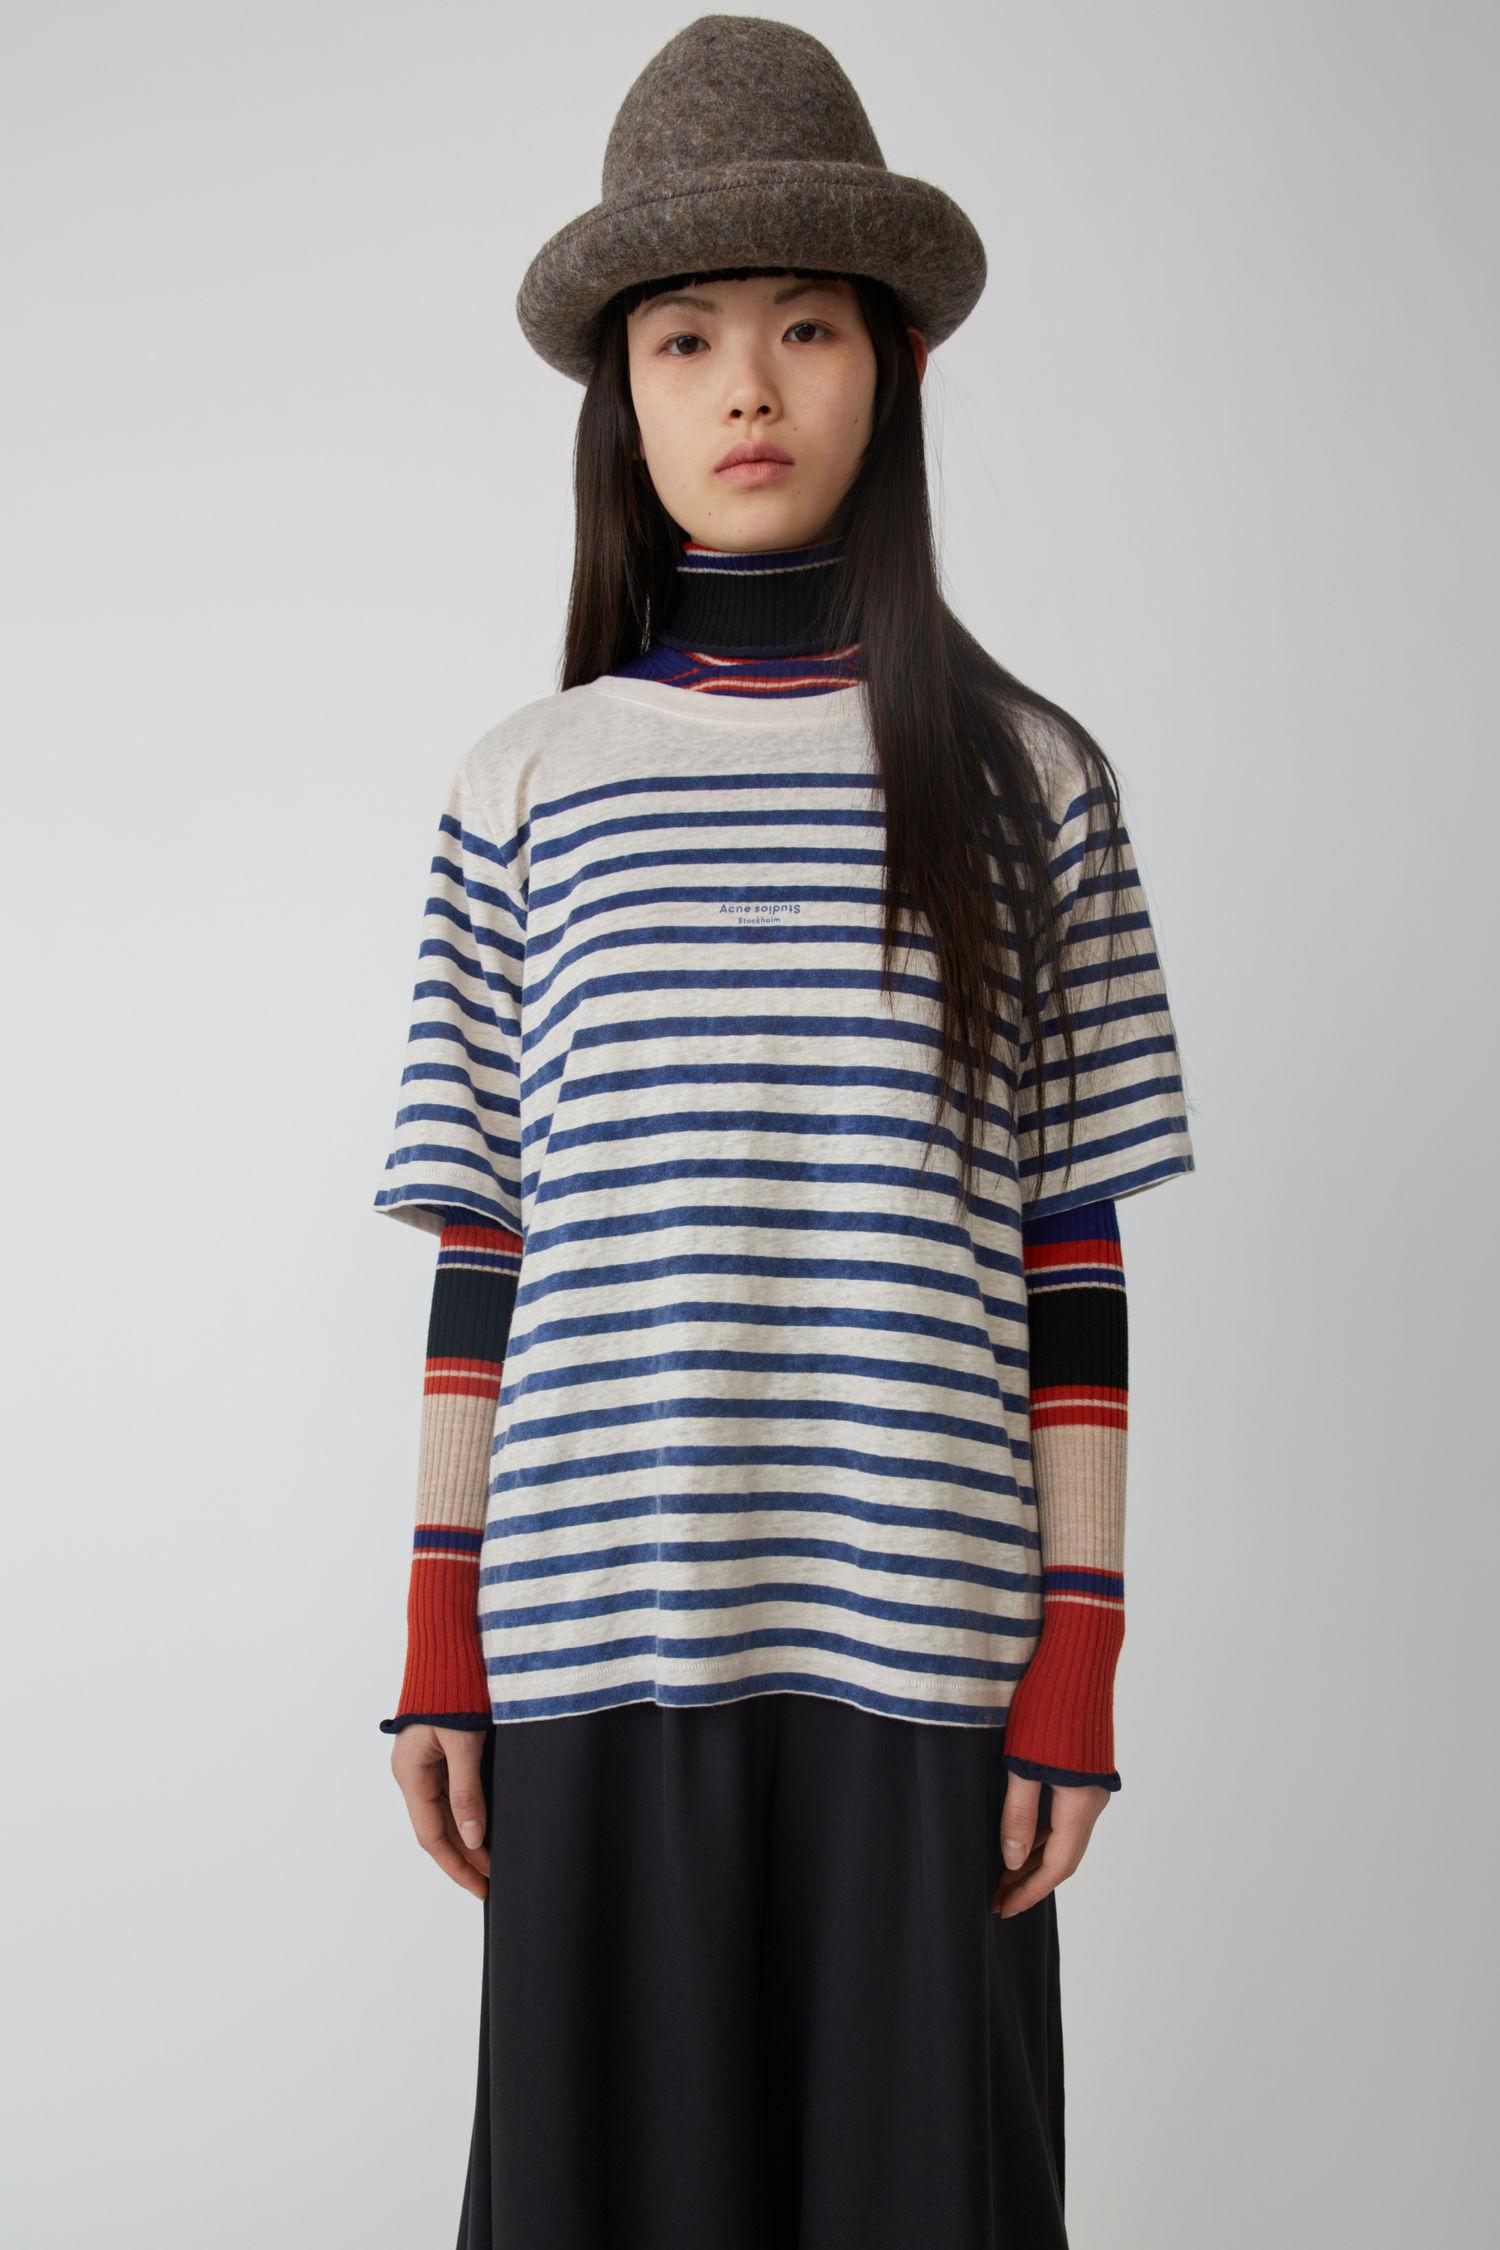 ACNE STUDIOS Striped linen t-shirt white/blue